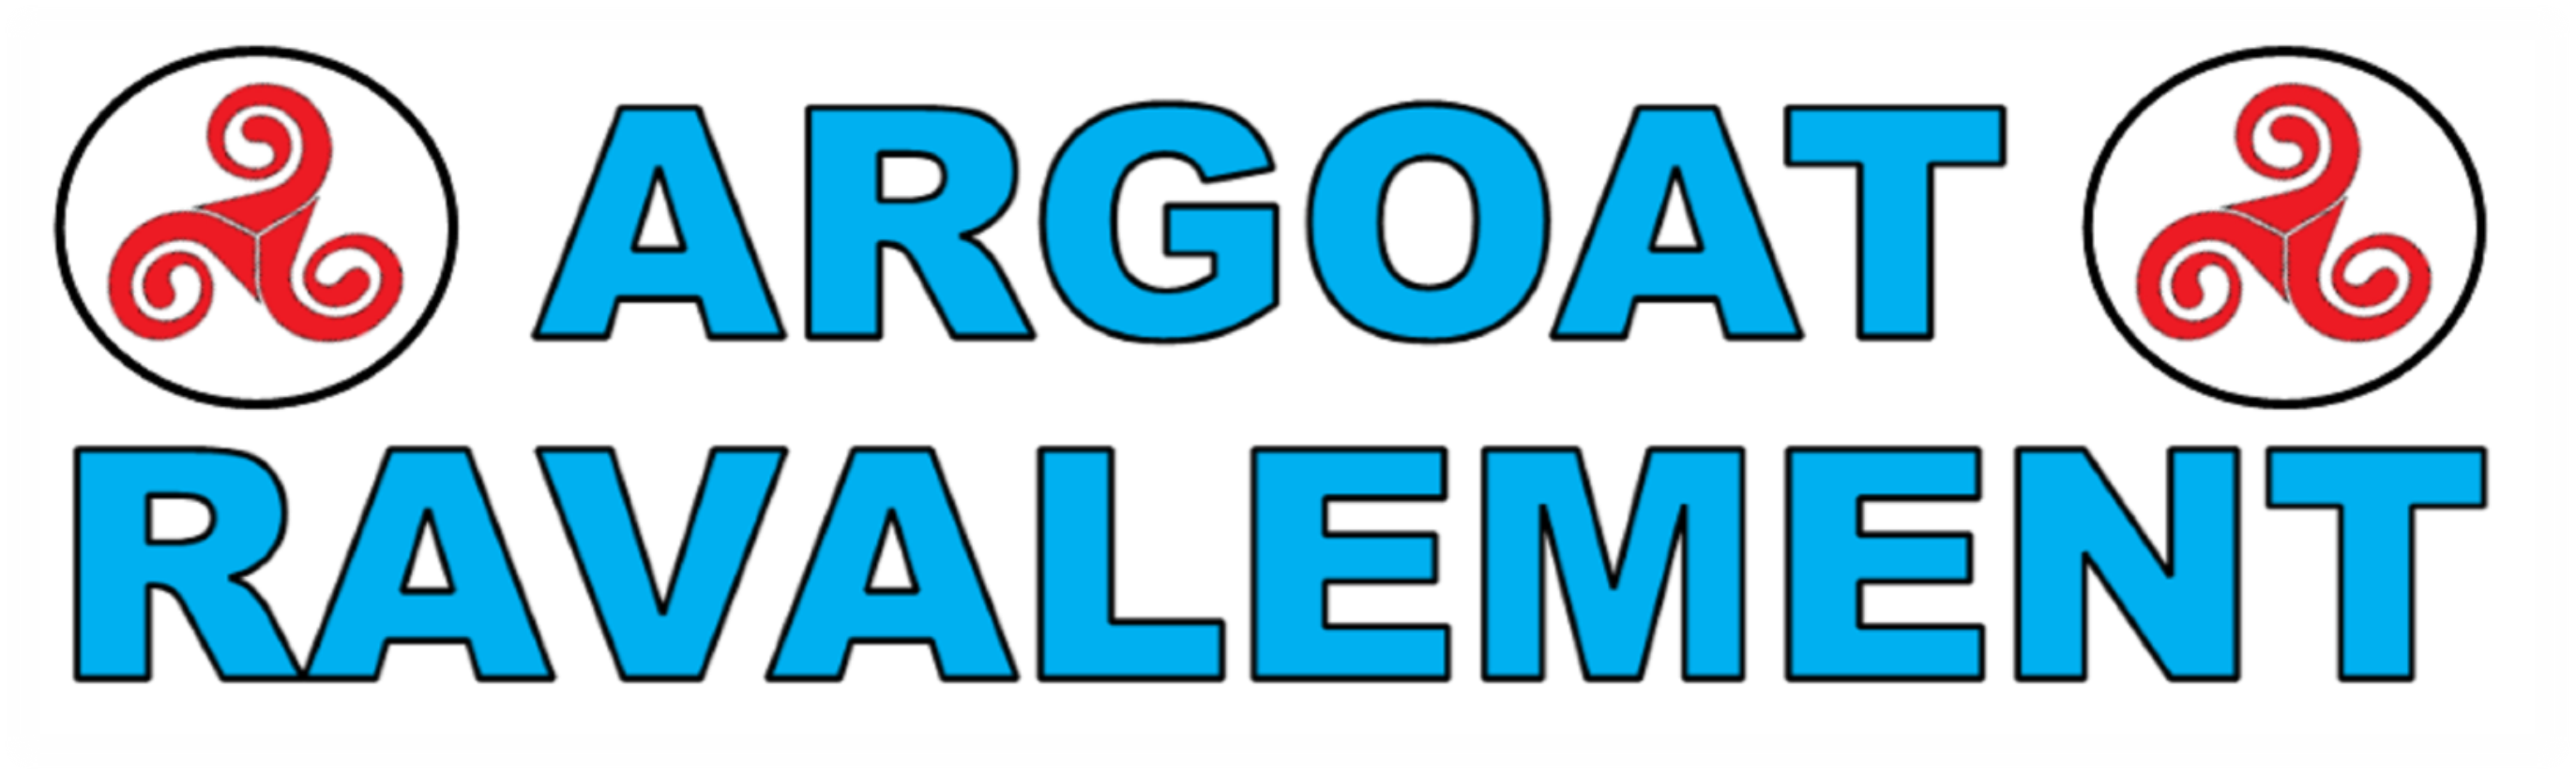 ARGOAT RAVALEMENT